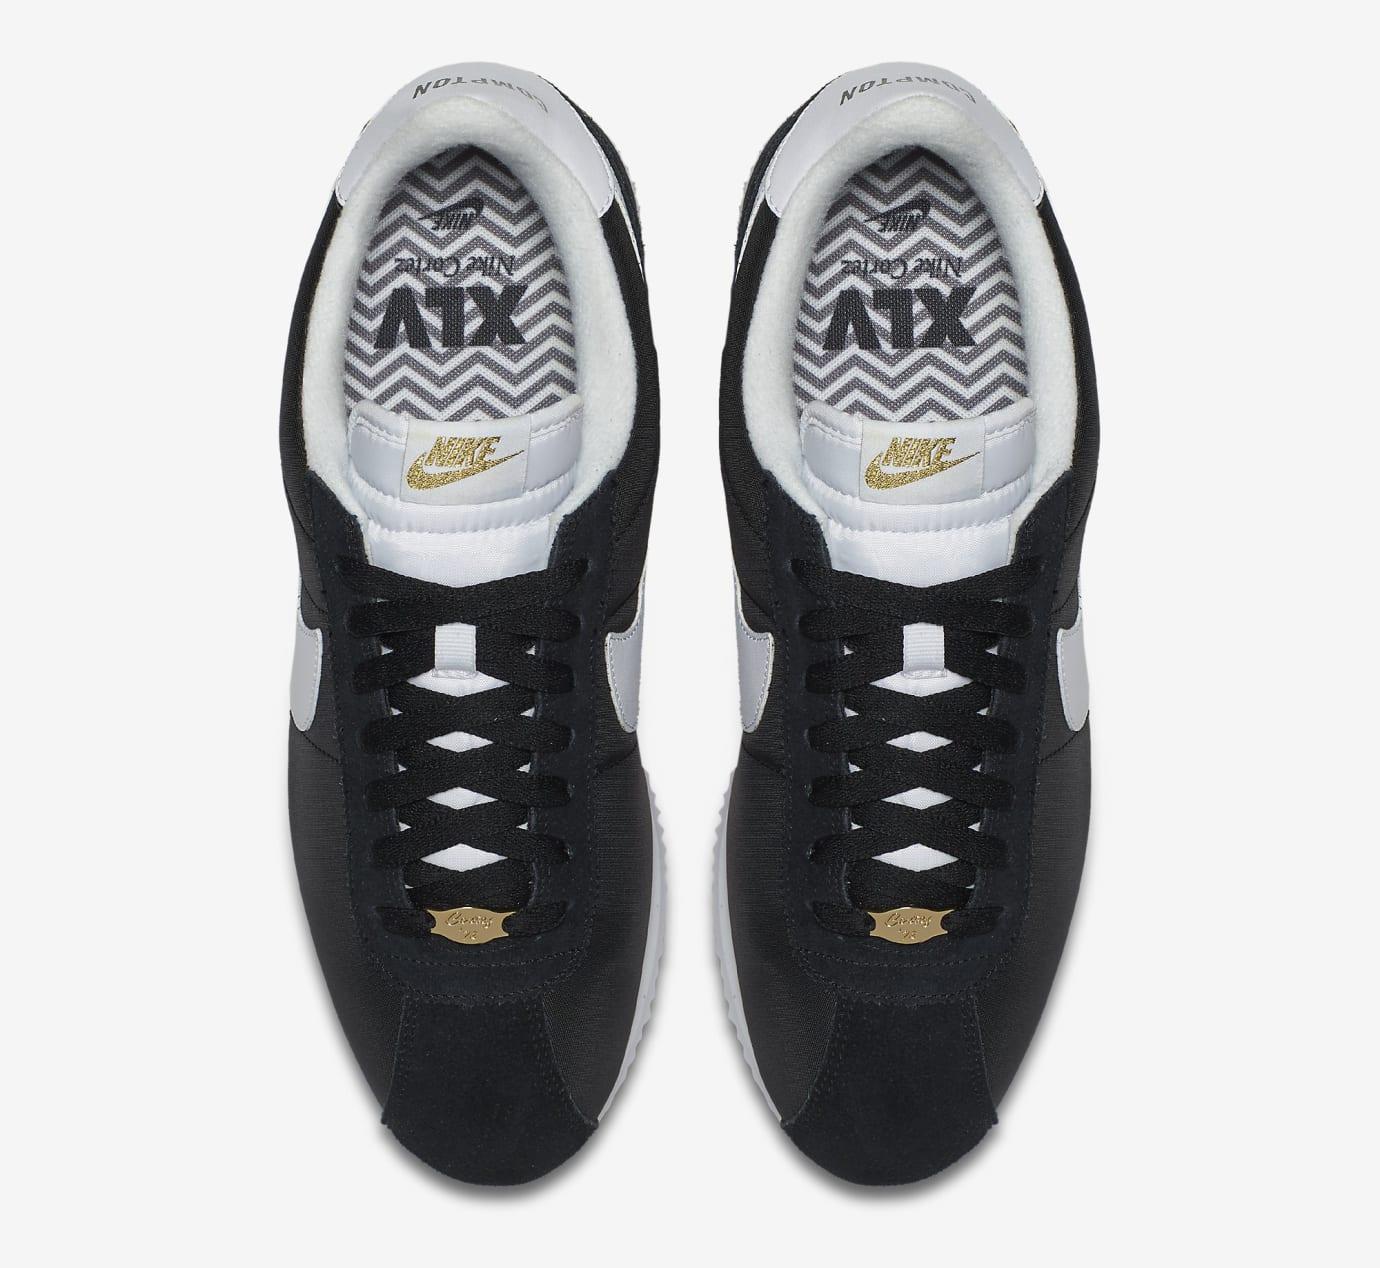 Nike Cortez Compton 902804-001 Top